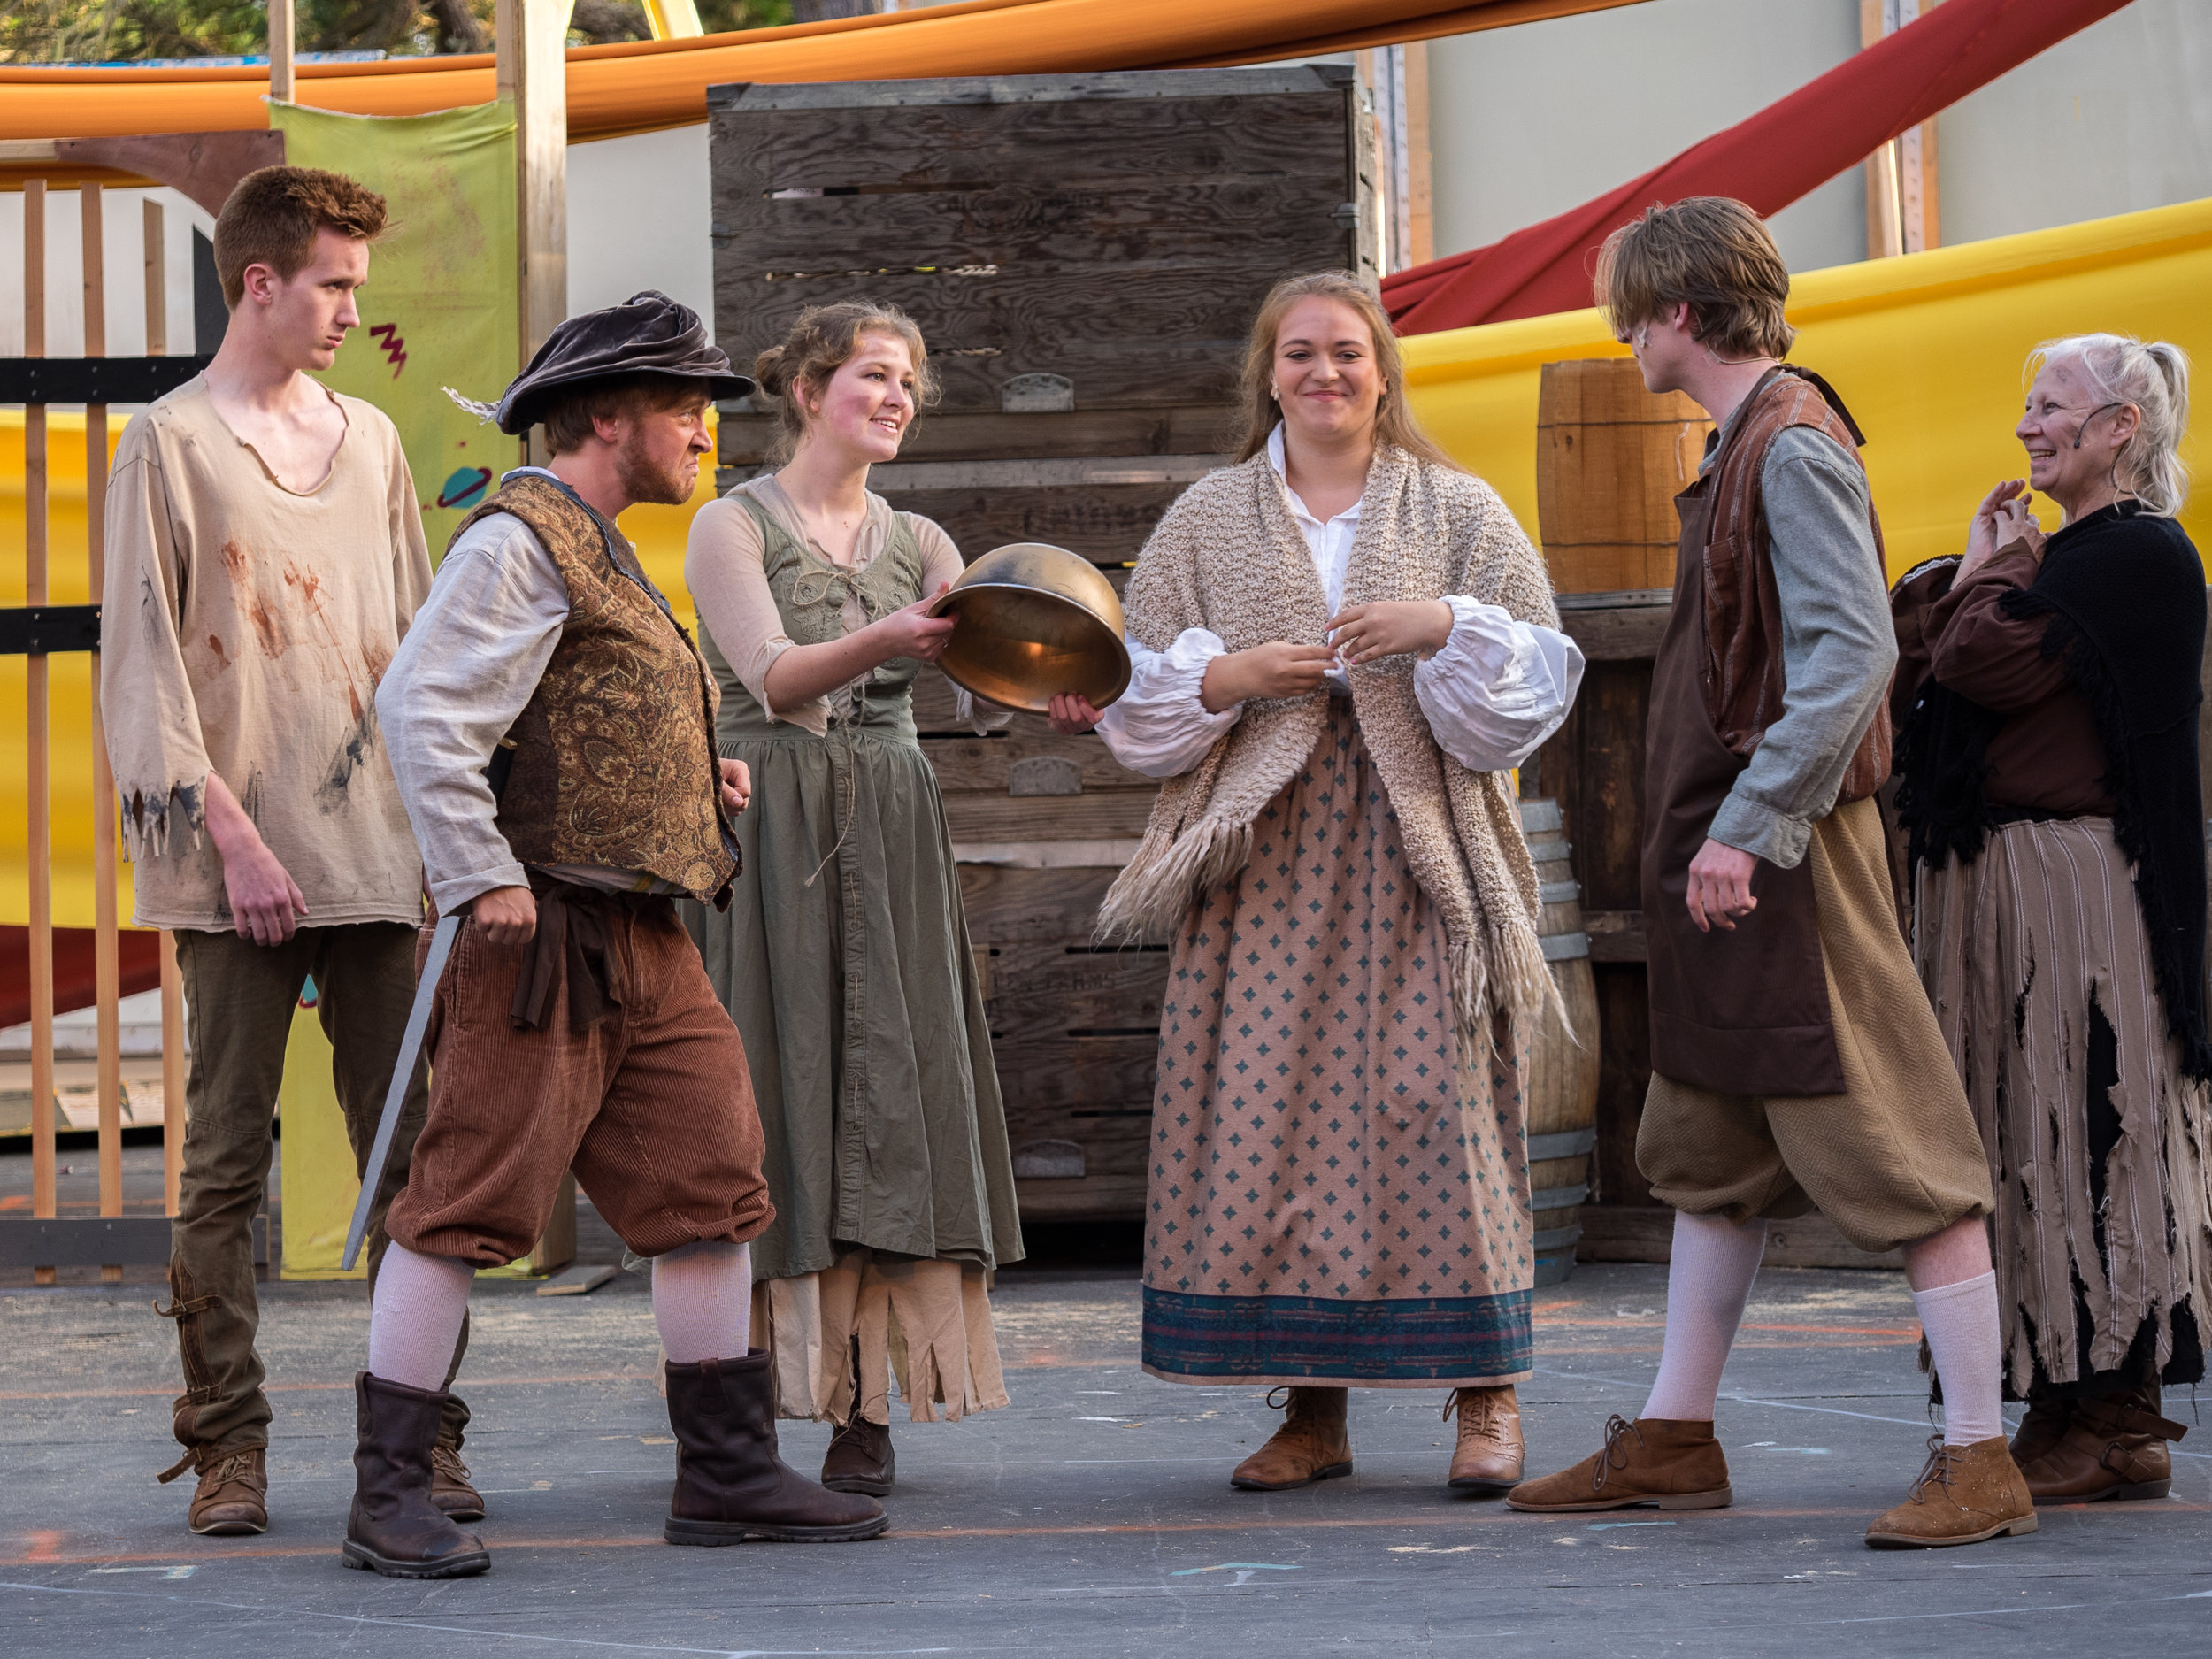 "(Left to right) Alex Thibbeau, Collin Skerritt, Dani Heimer, Audrey Moonan, Ty Barrett, and Linda Felice cant help but laugh during ""Golden Helmet of Mambrino"" in Man of La Mancha."